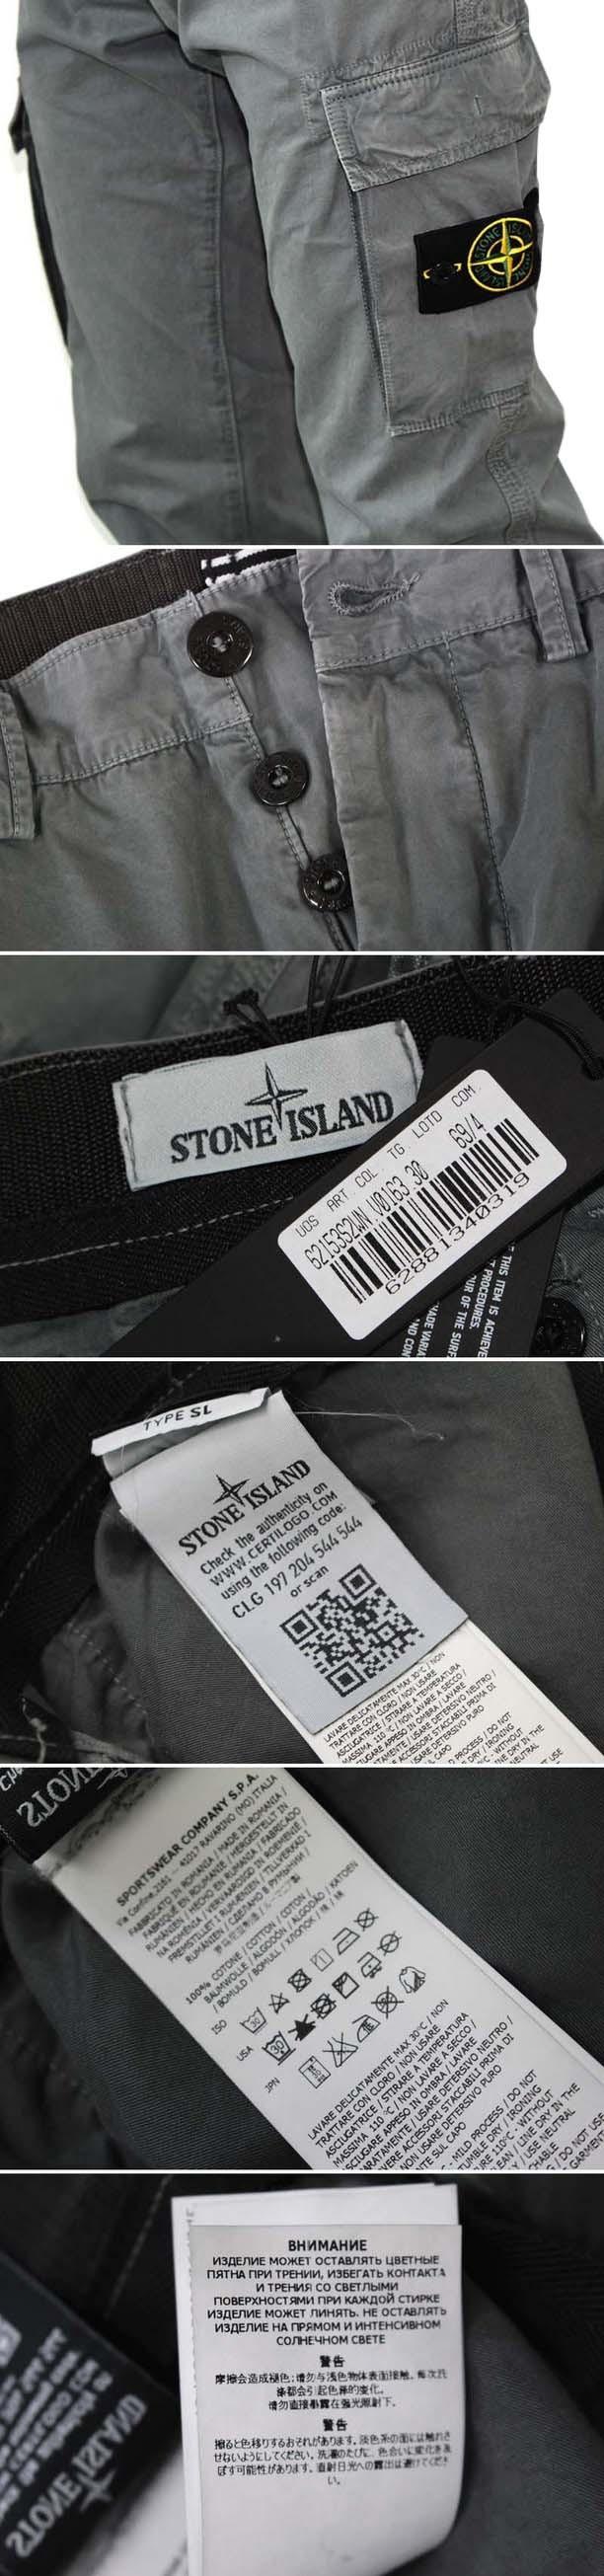 2550d71b59d 상품에 관한 상세 정보는 아래의 상품문의게시판으로 판매자에게 문의해 주시기 바랍니다 - 상품의 색상은 모니터 해상도나 설정에 따라  조금씩 다르게 보일수 ...